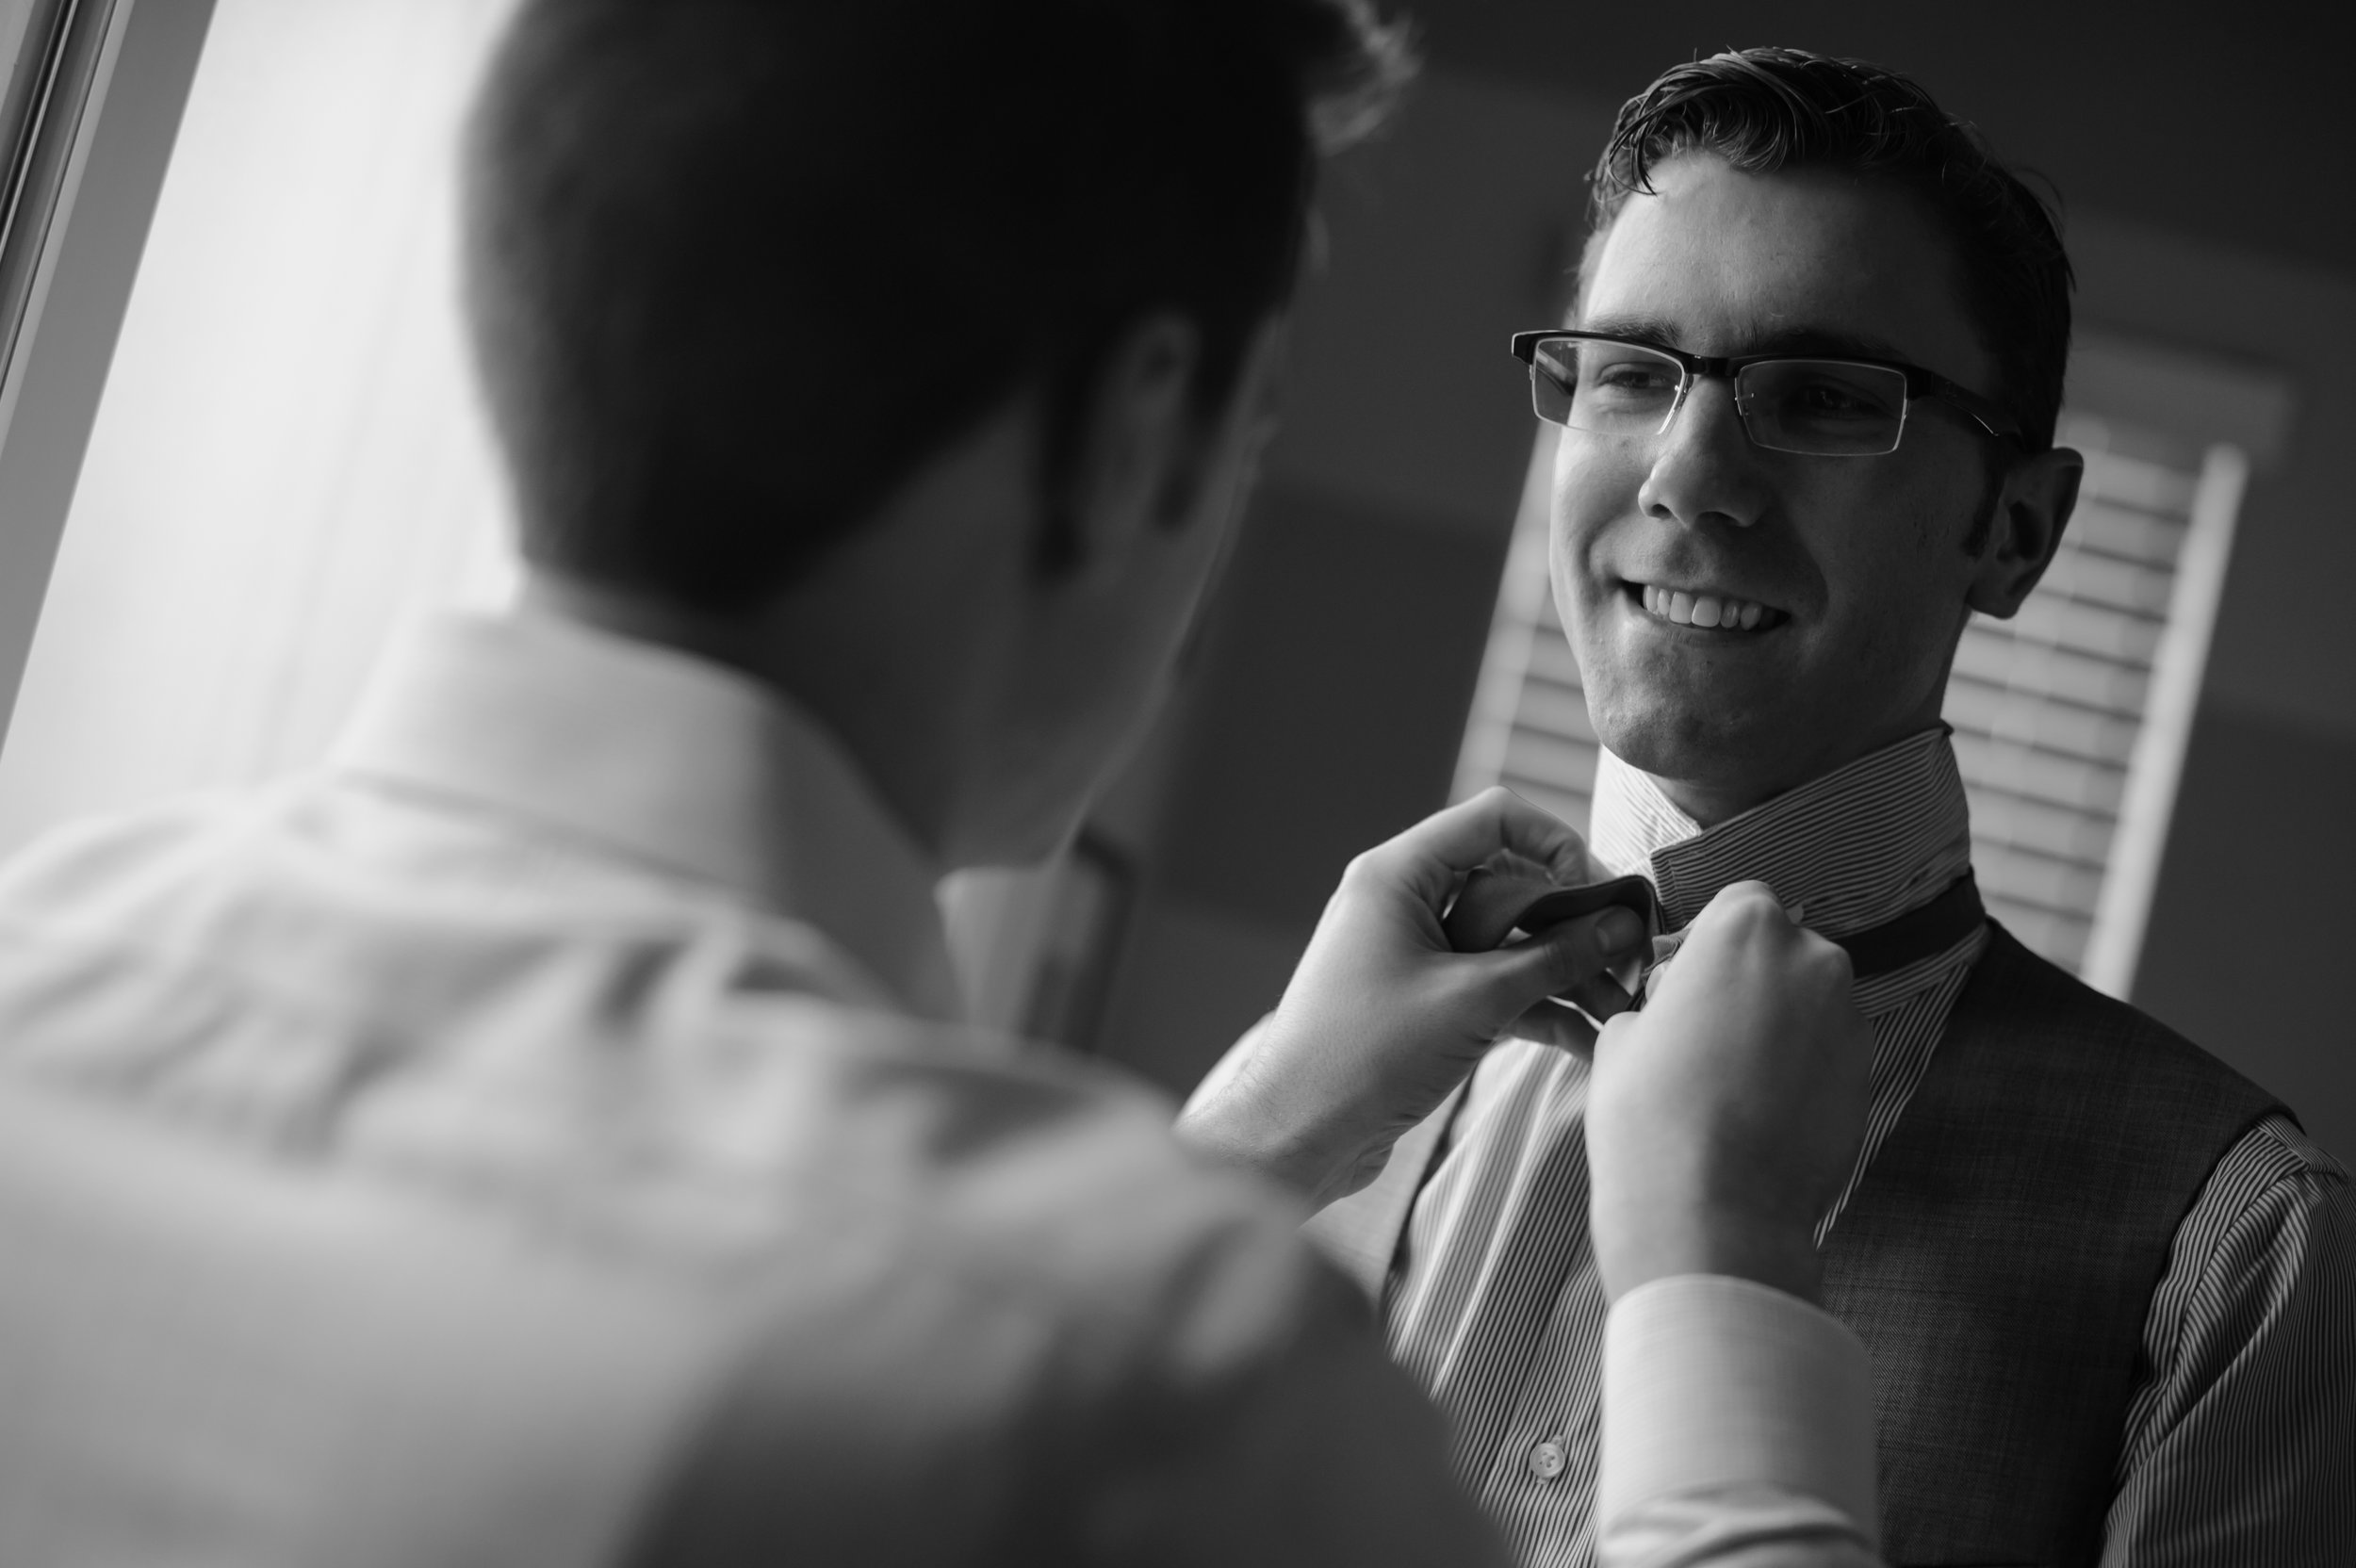 josh-parker-005-same-sex-sacramento-wedding-photographer-katherine-nicole-photography.JPG